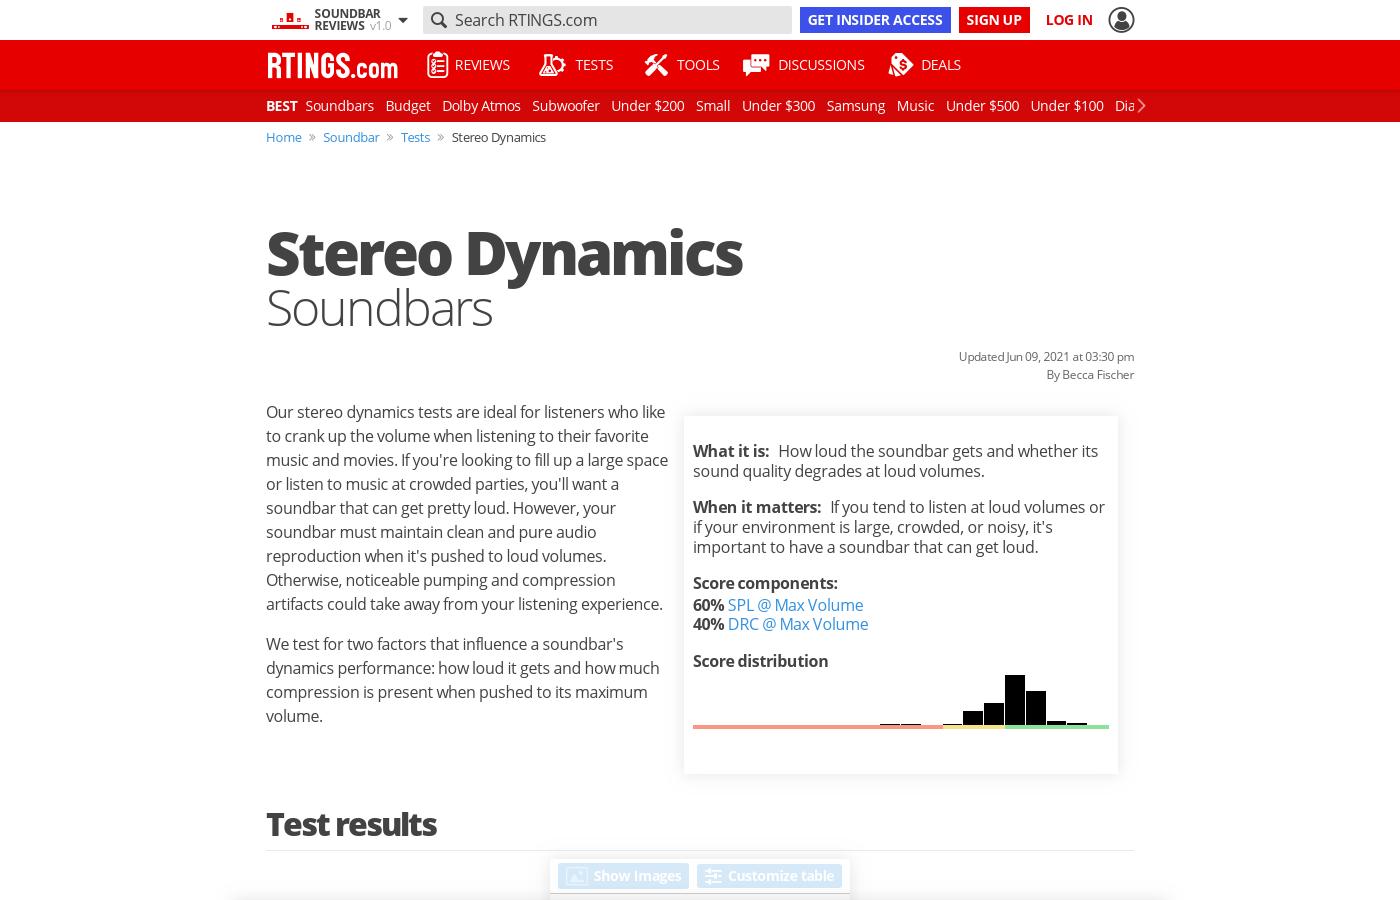 Stereo Dynamics